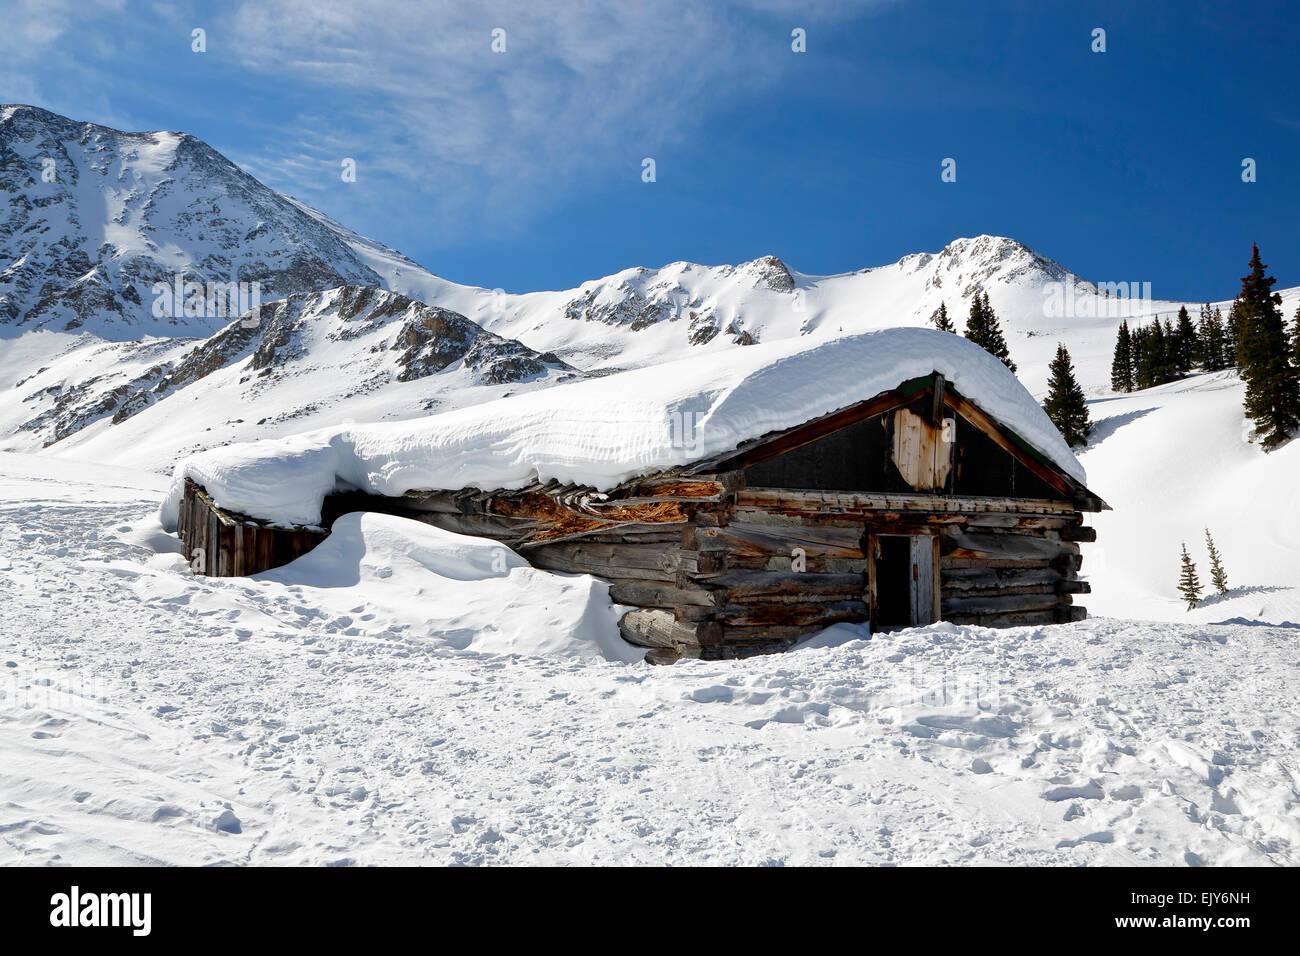 Snow-covered Ten-Mile Range and ruined log cabin, Boston Mine, Mayflower Gulch, near Copper Mountain, Colorado USA - Stock Image